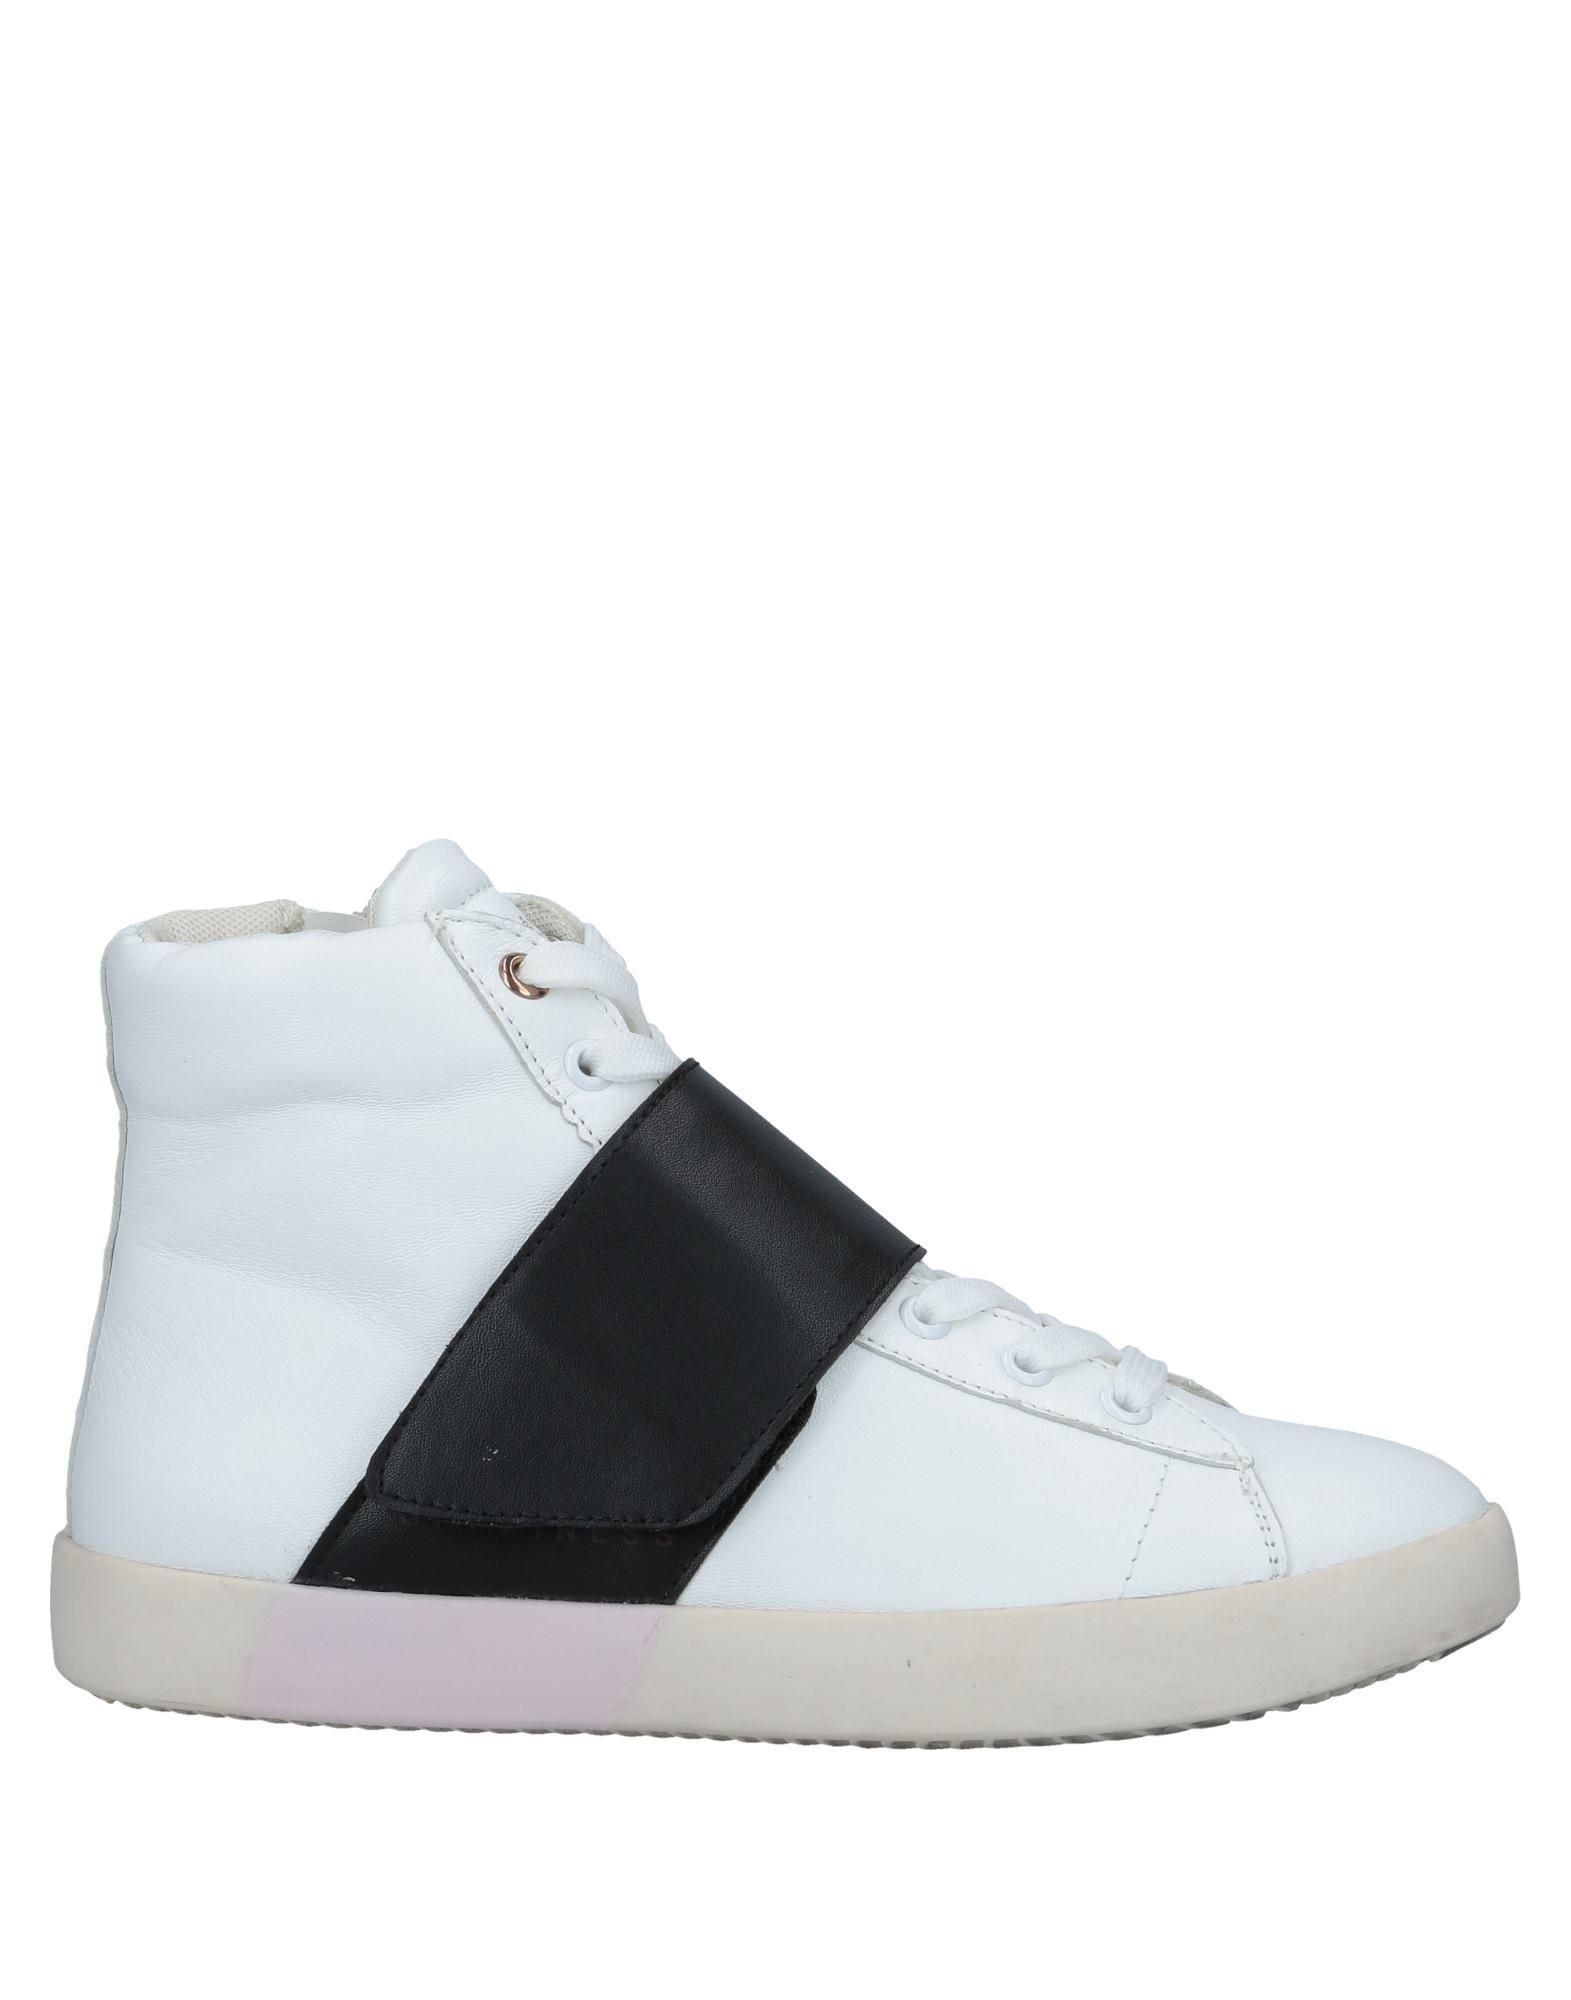 Sneakers comode Happiness Donna - 11548075RL Scarpe comode Sneakers e distintive da277b